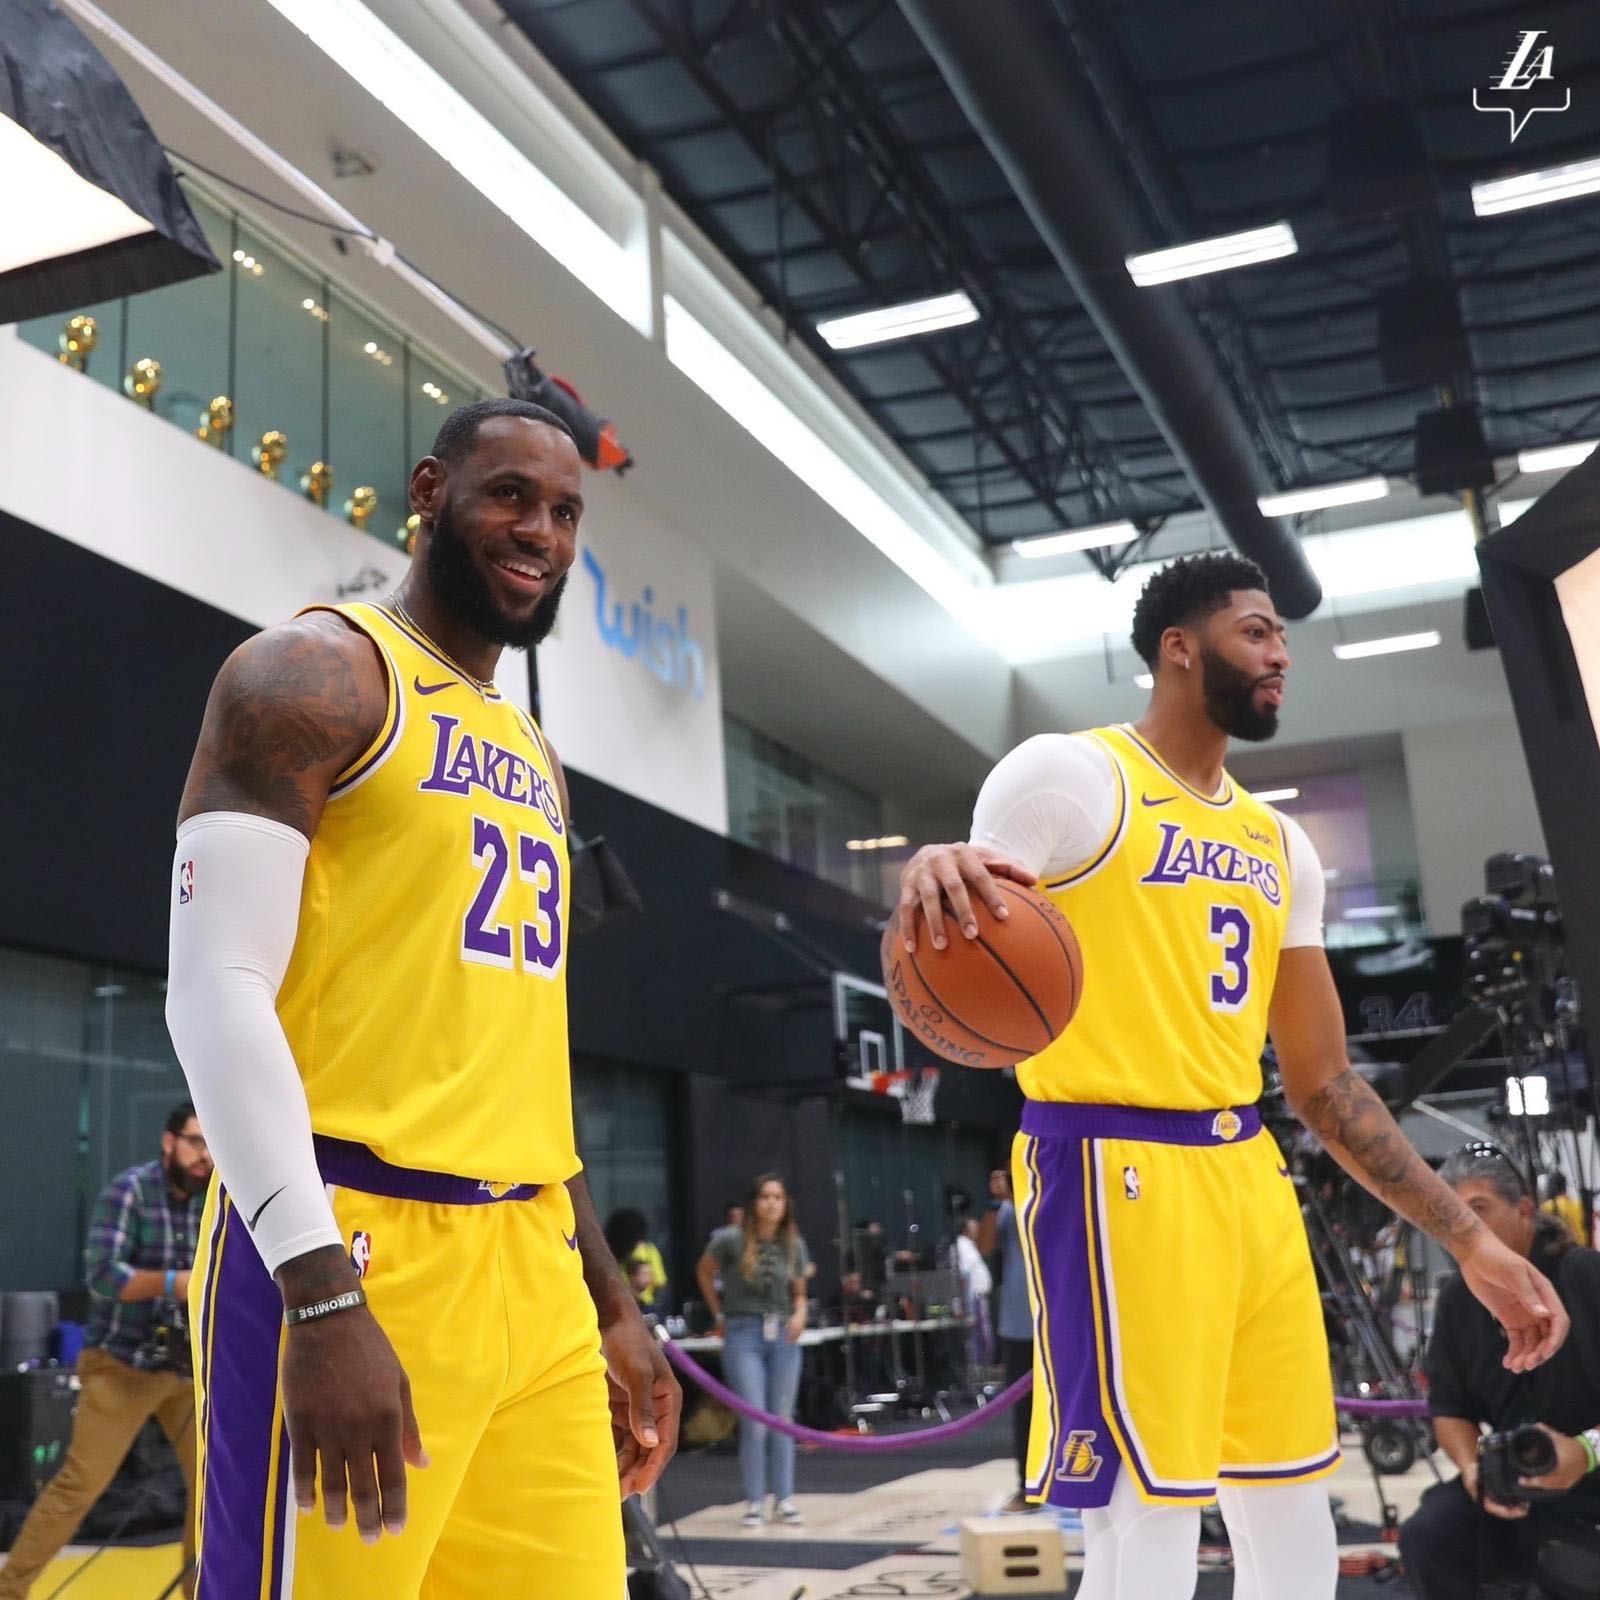 Lakers Basketball players, Lakers game, Lebron James, Anthony Davis